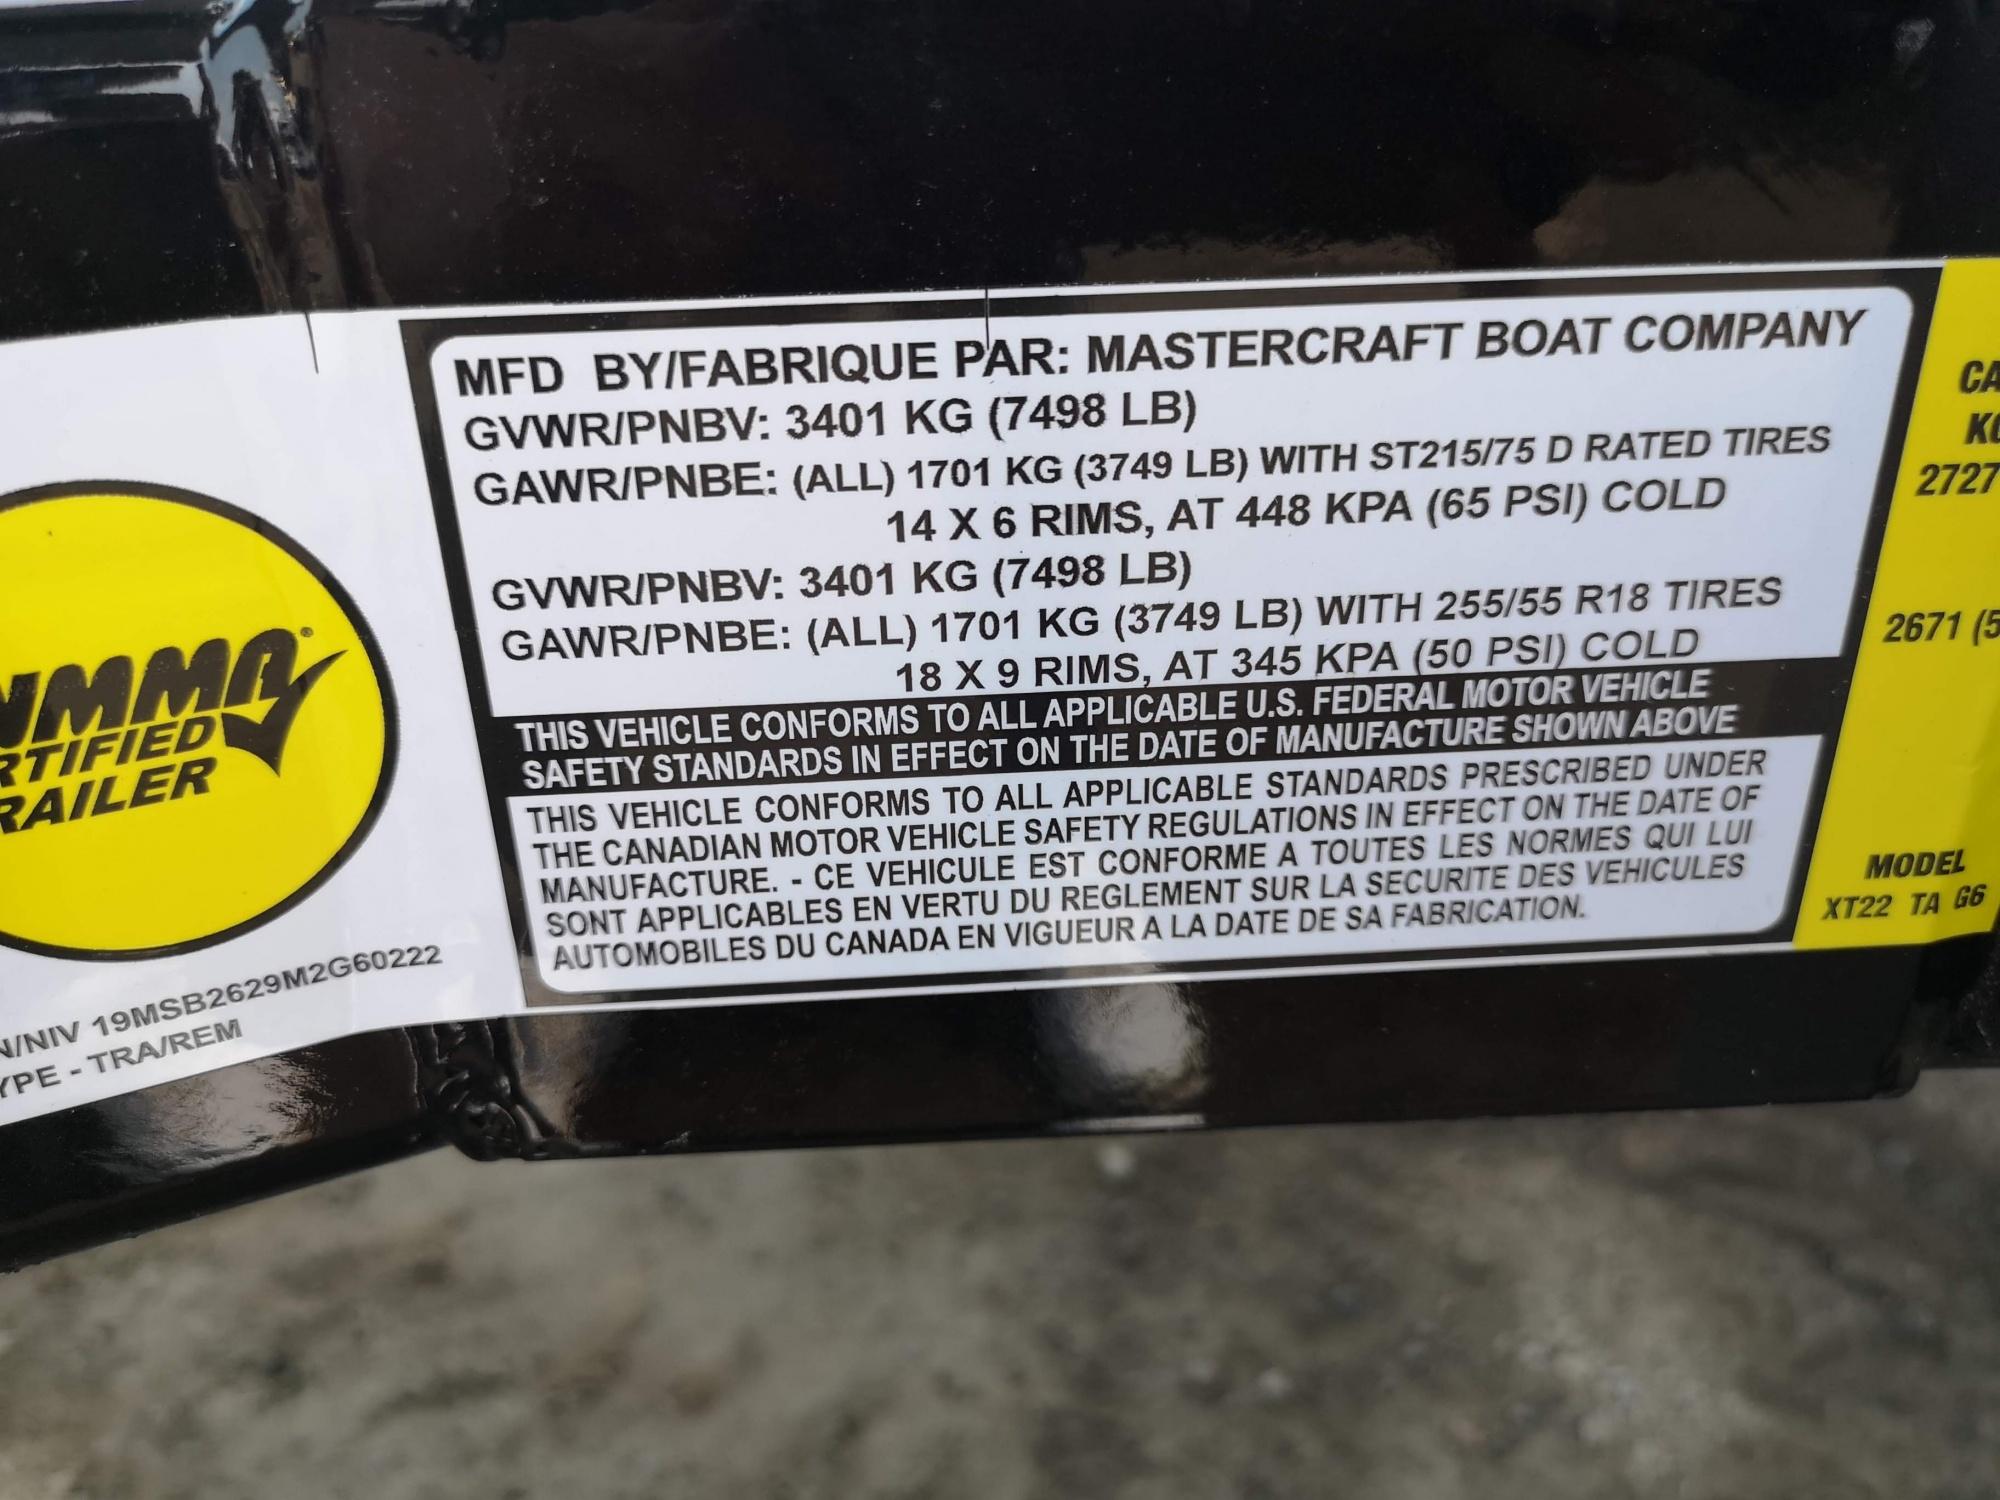 Mastercraft XT 22 - IMG_20210519_135120